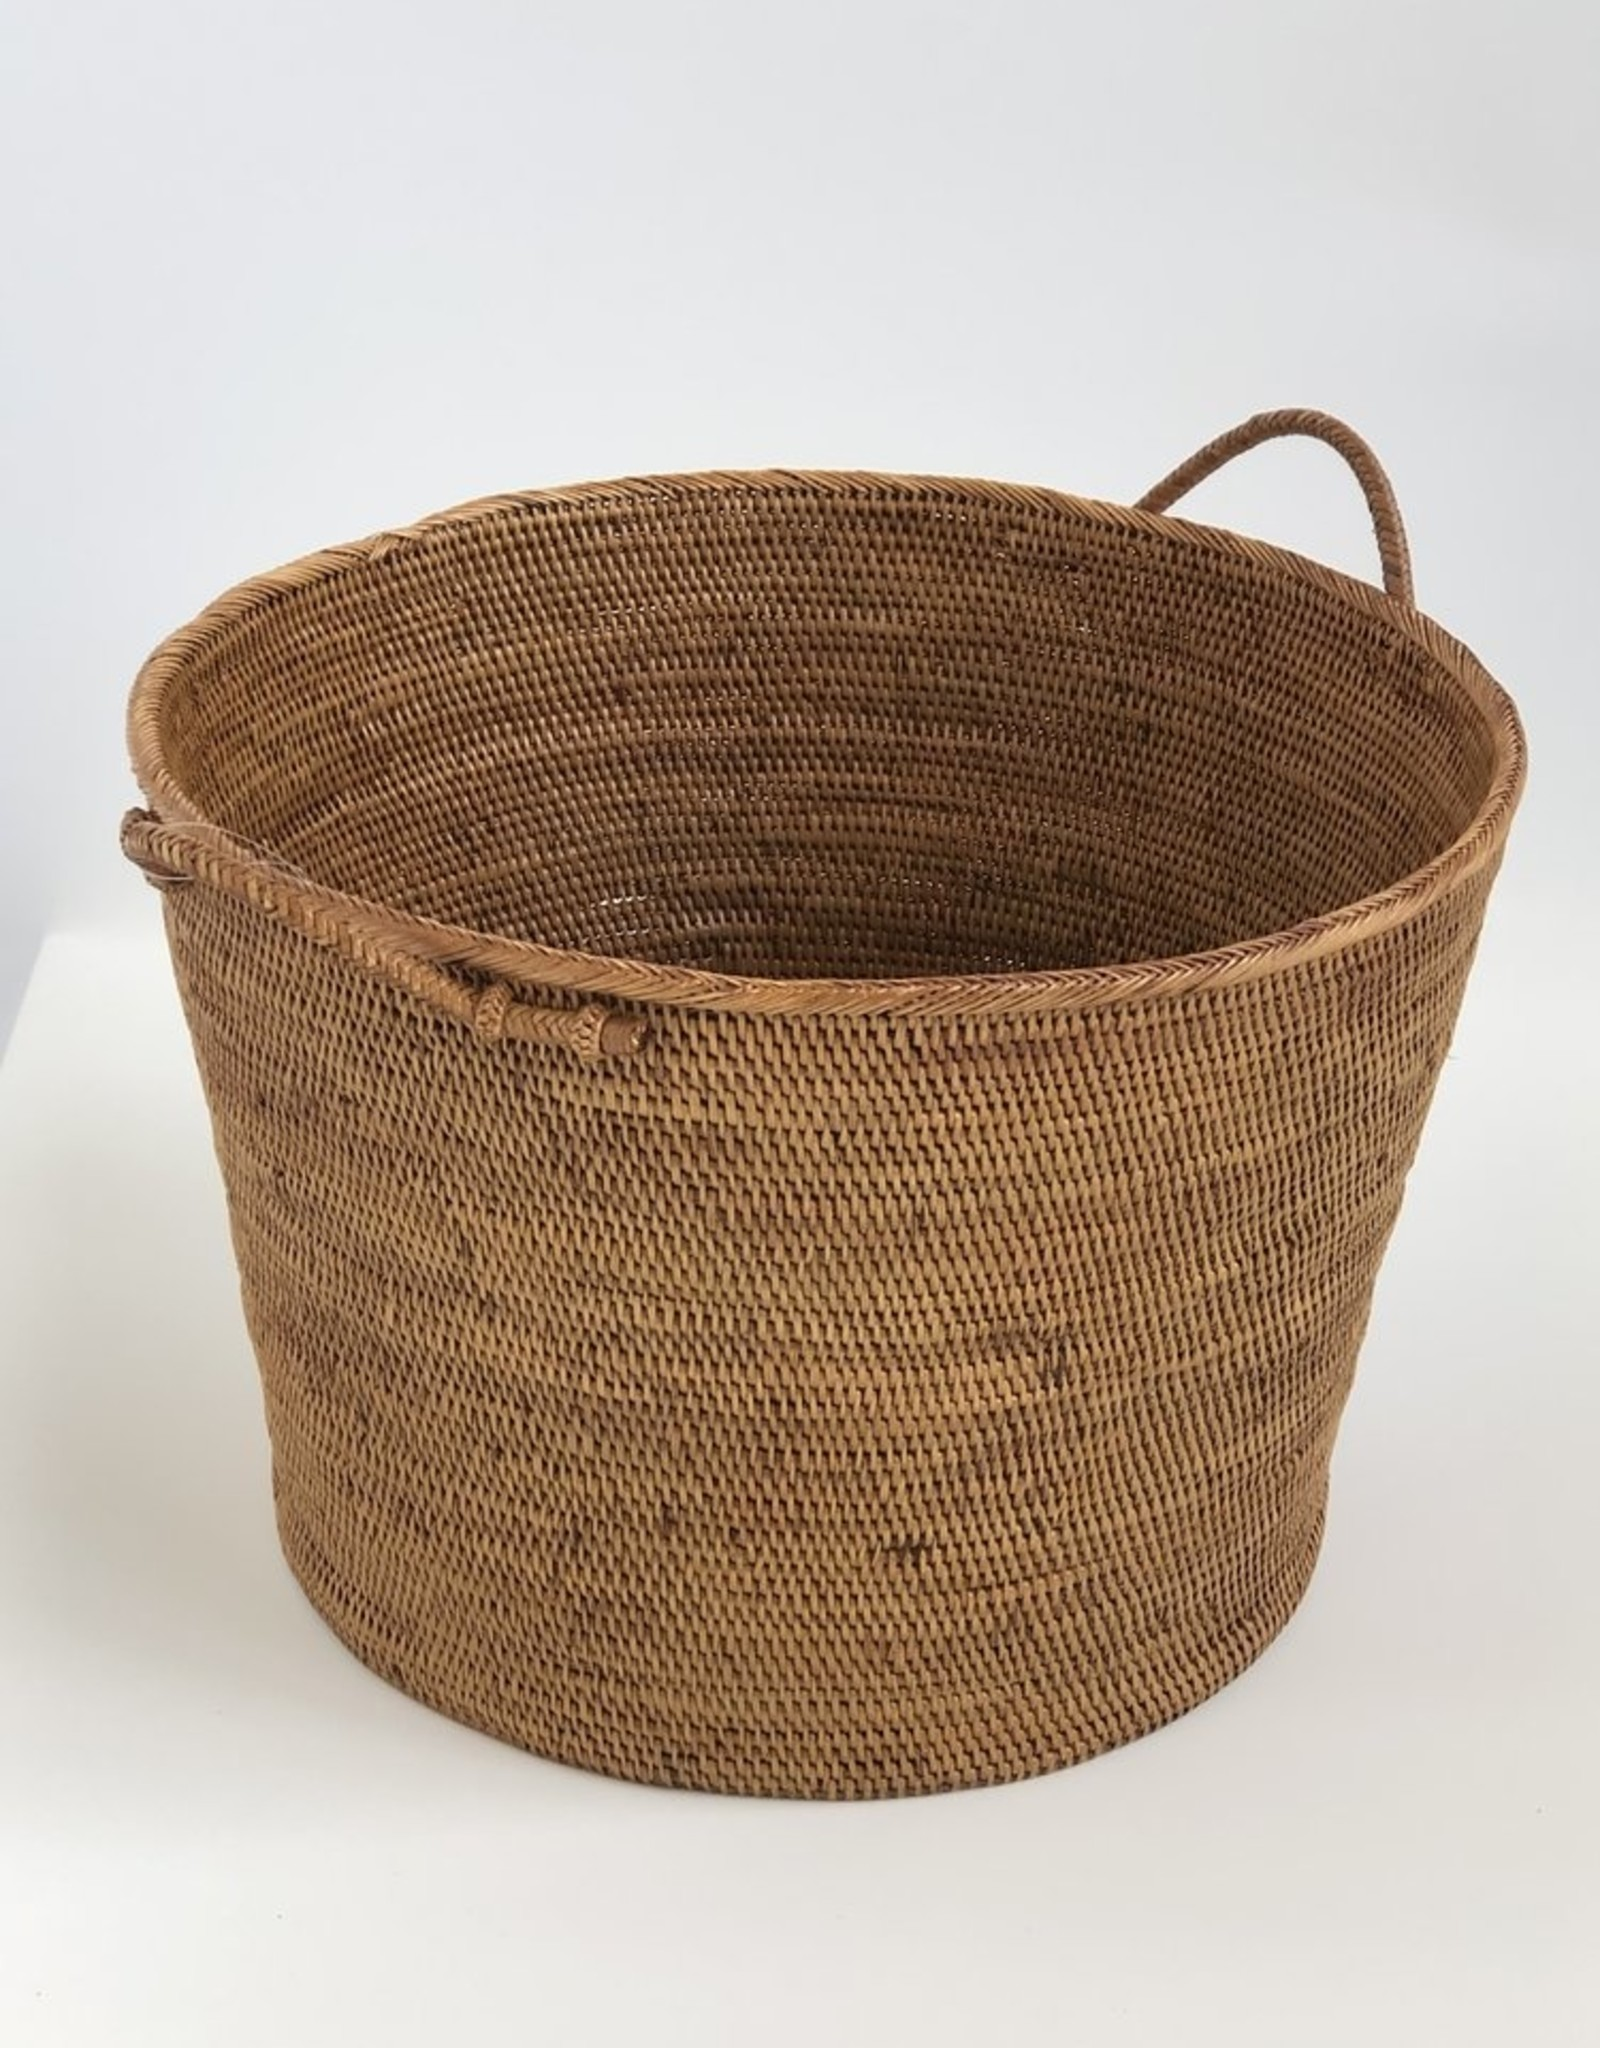 AndYu Ata Grass Laundry Basket